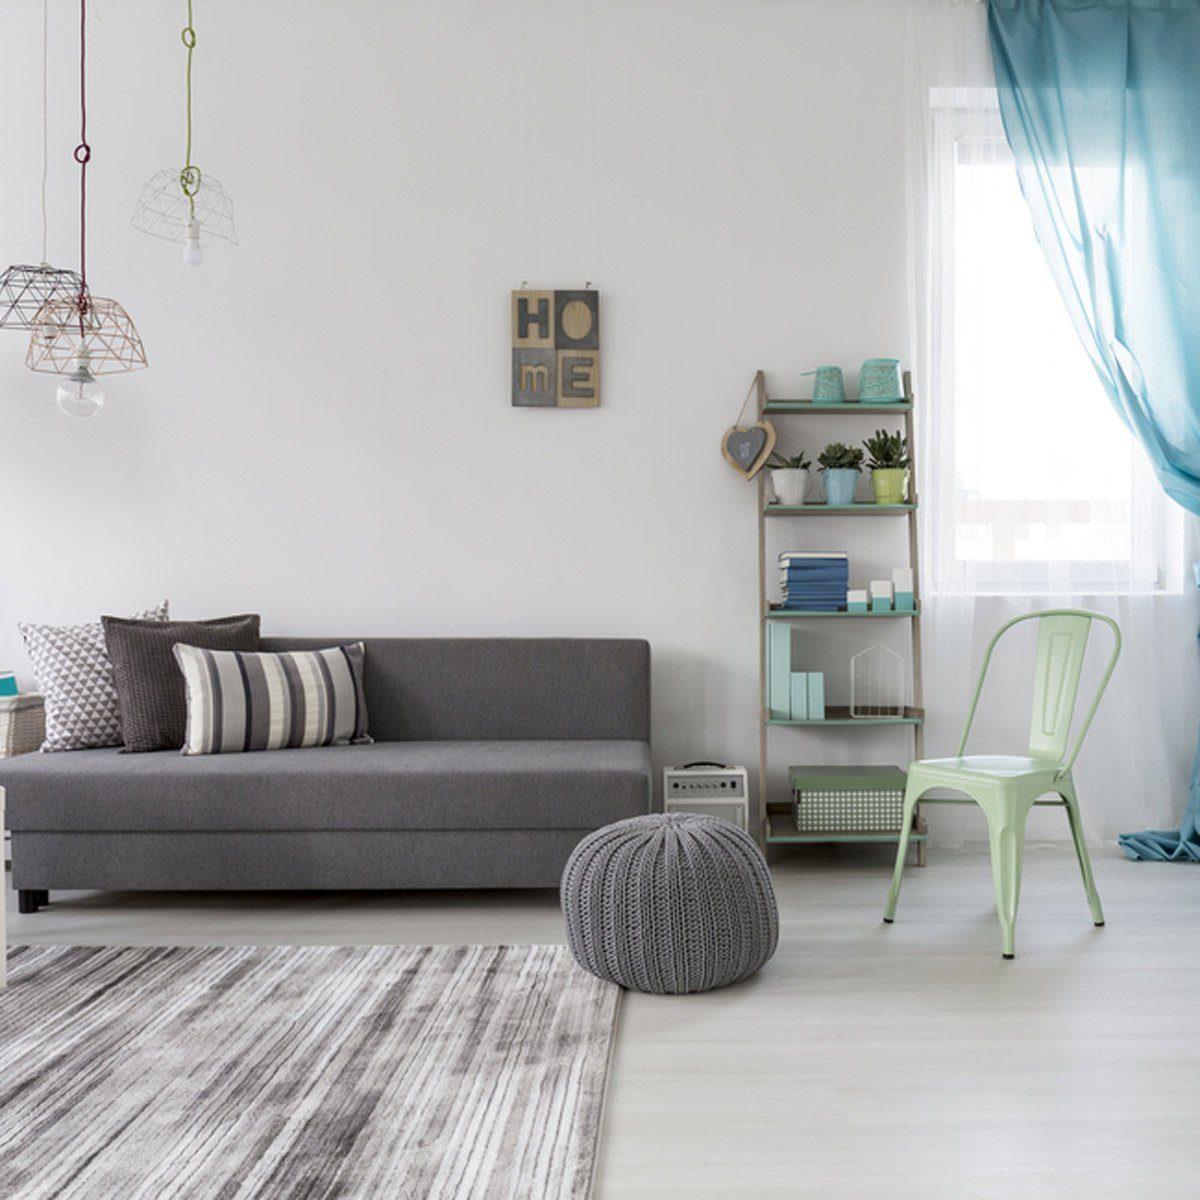 Interior Design Tips: Add Texture